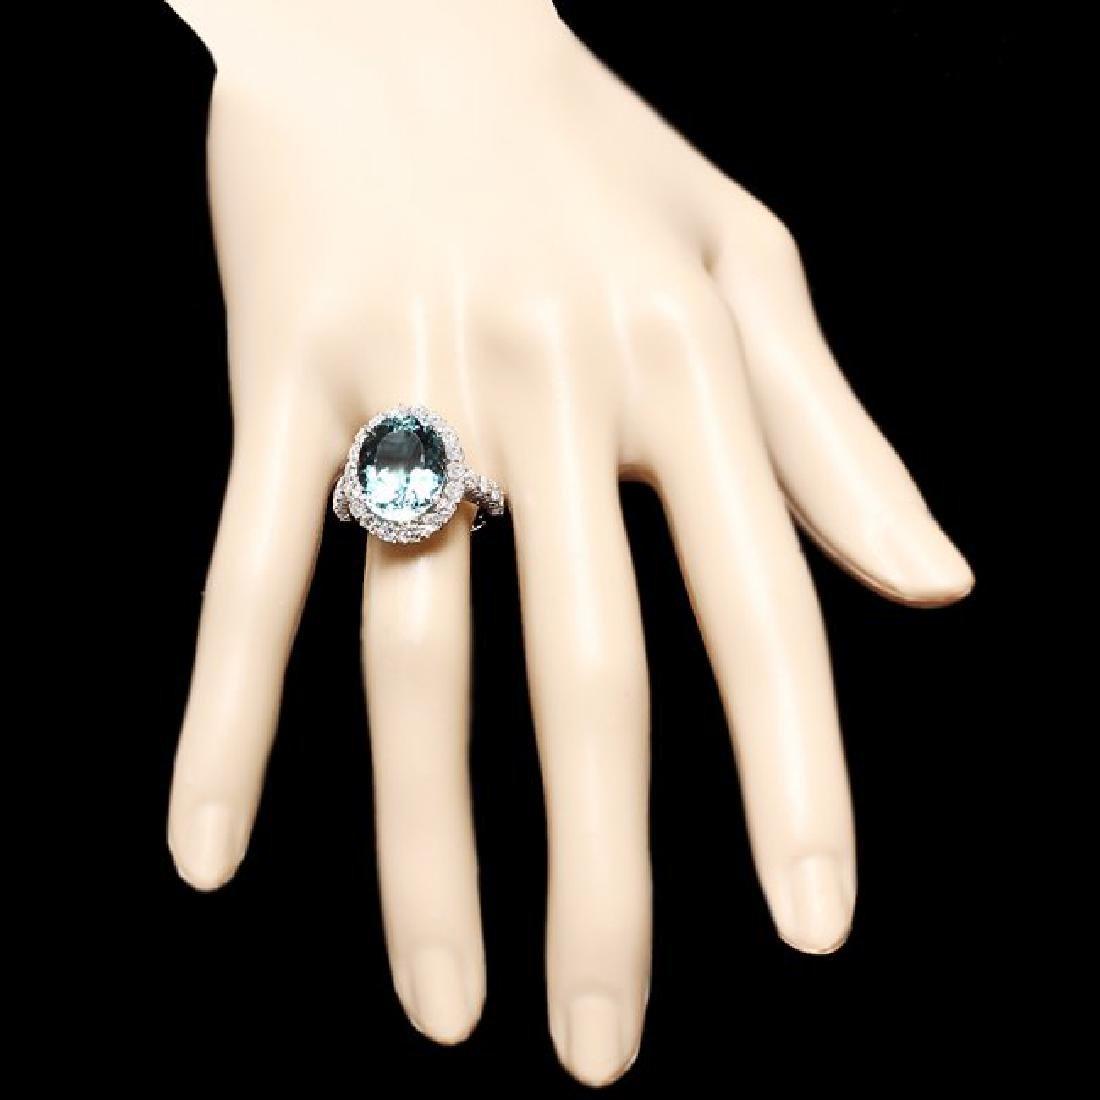 14k Gold 7.50ct Aquamarine 1.55ct Diamond Ring - 4